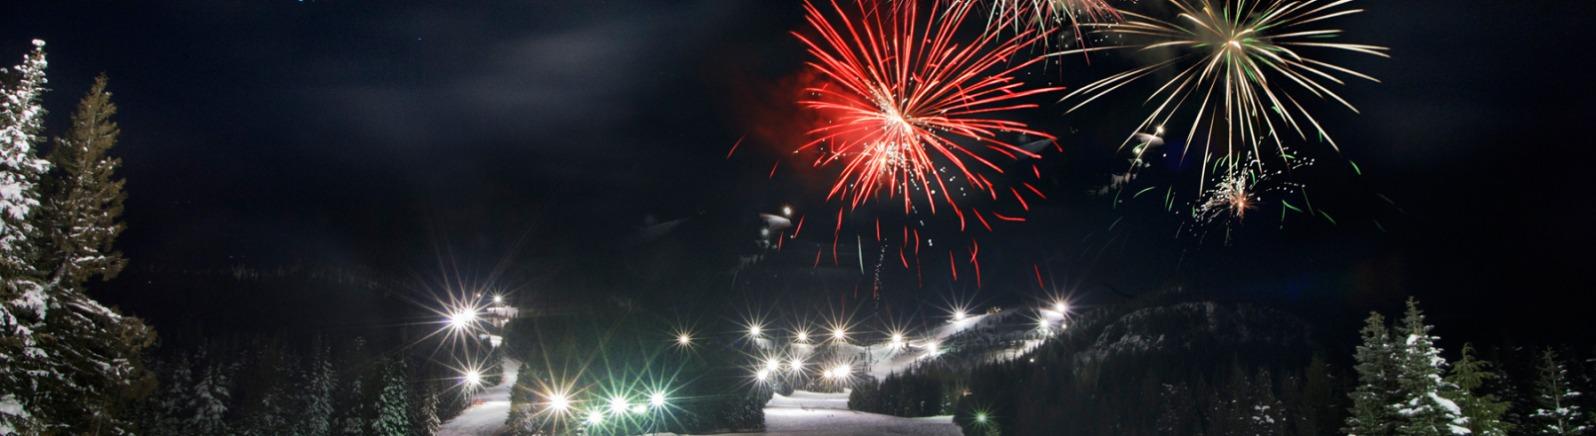 Mt Hood Skibowl, Night Skiing, Fireworks